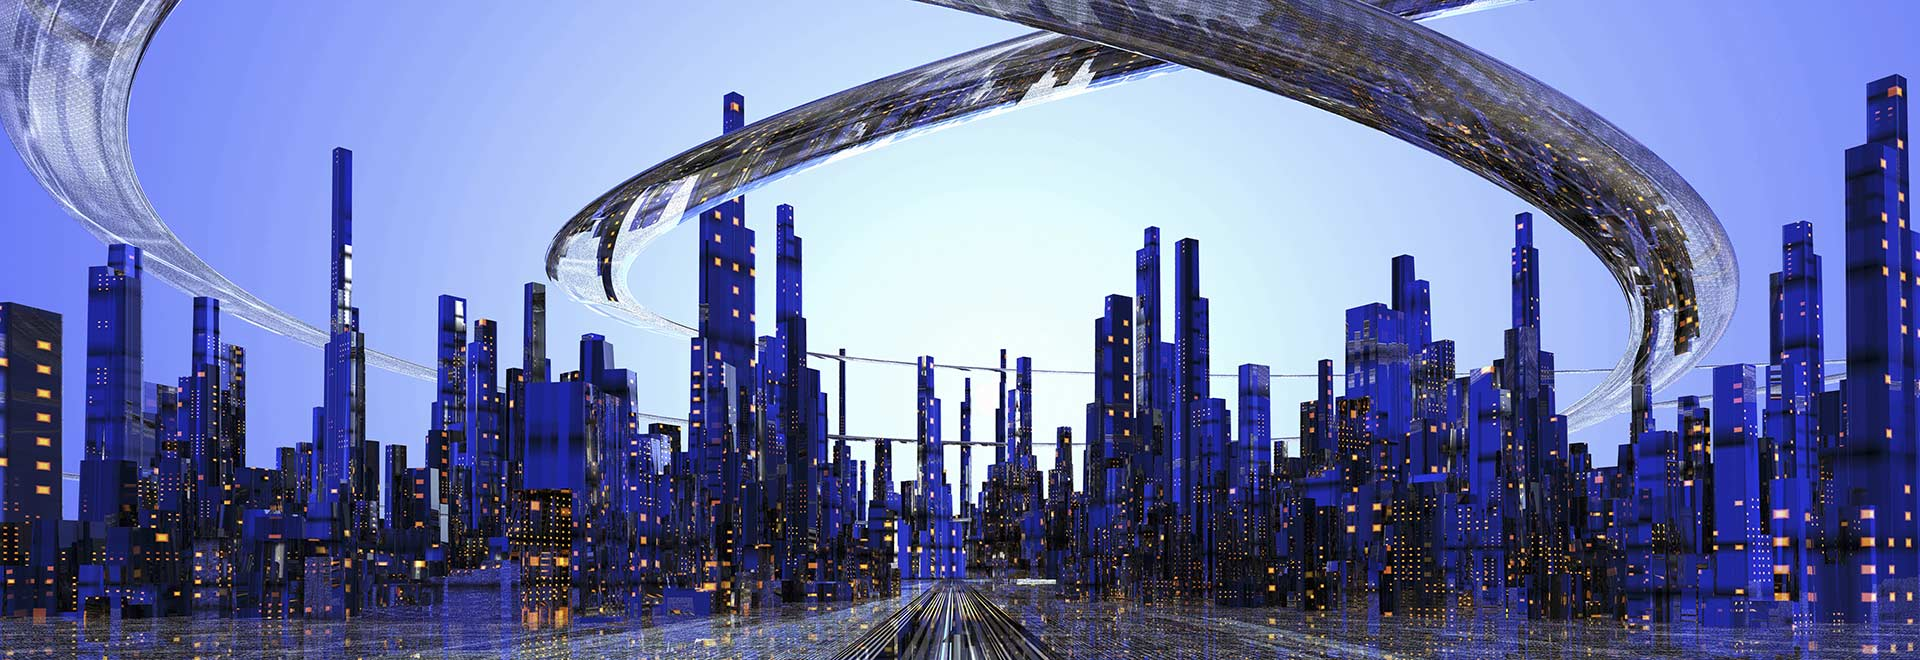 smart-city-shutterstock_200360147